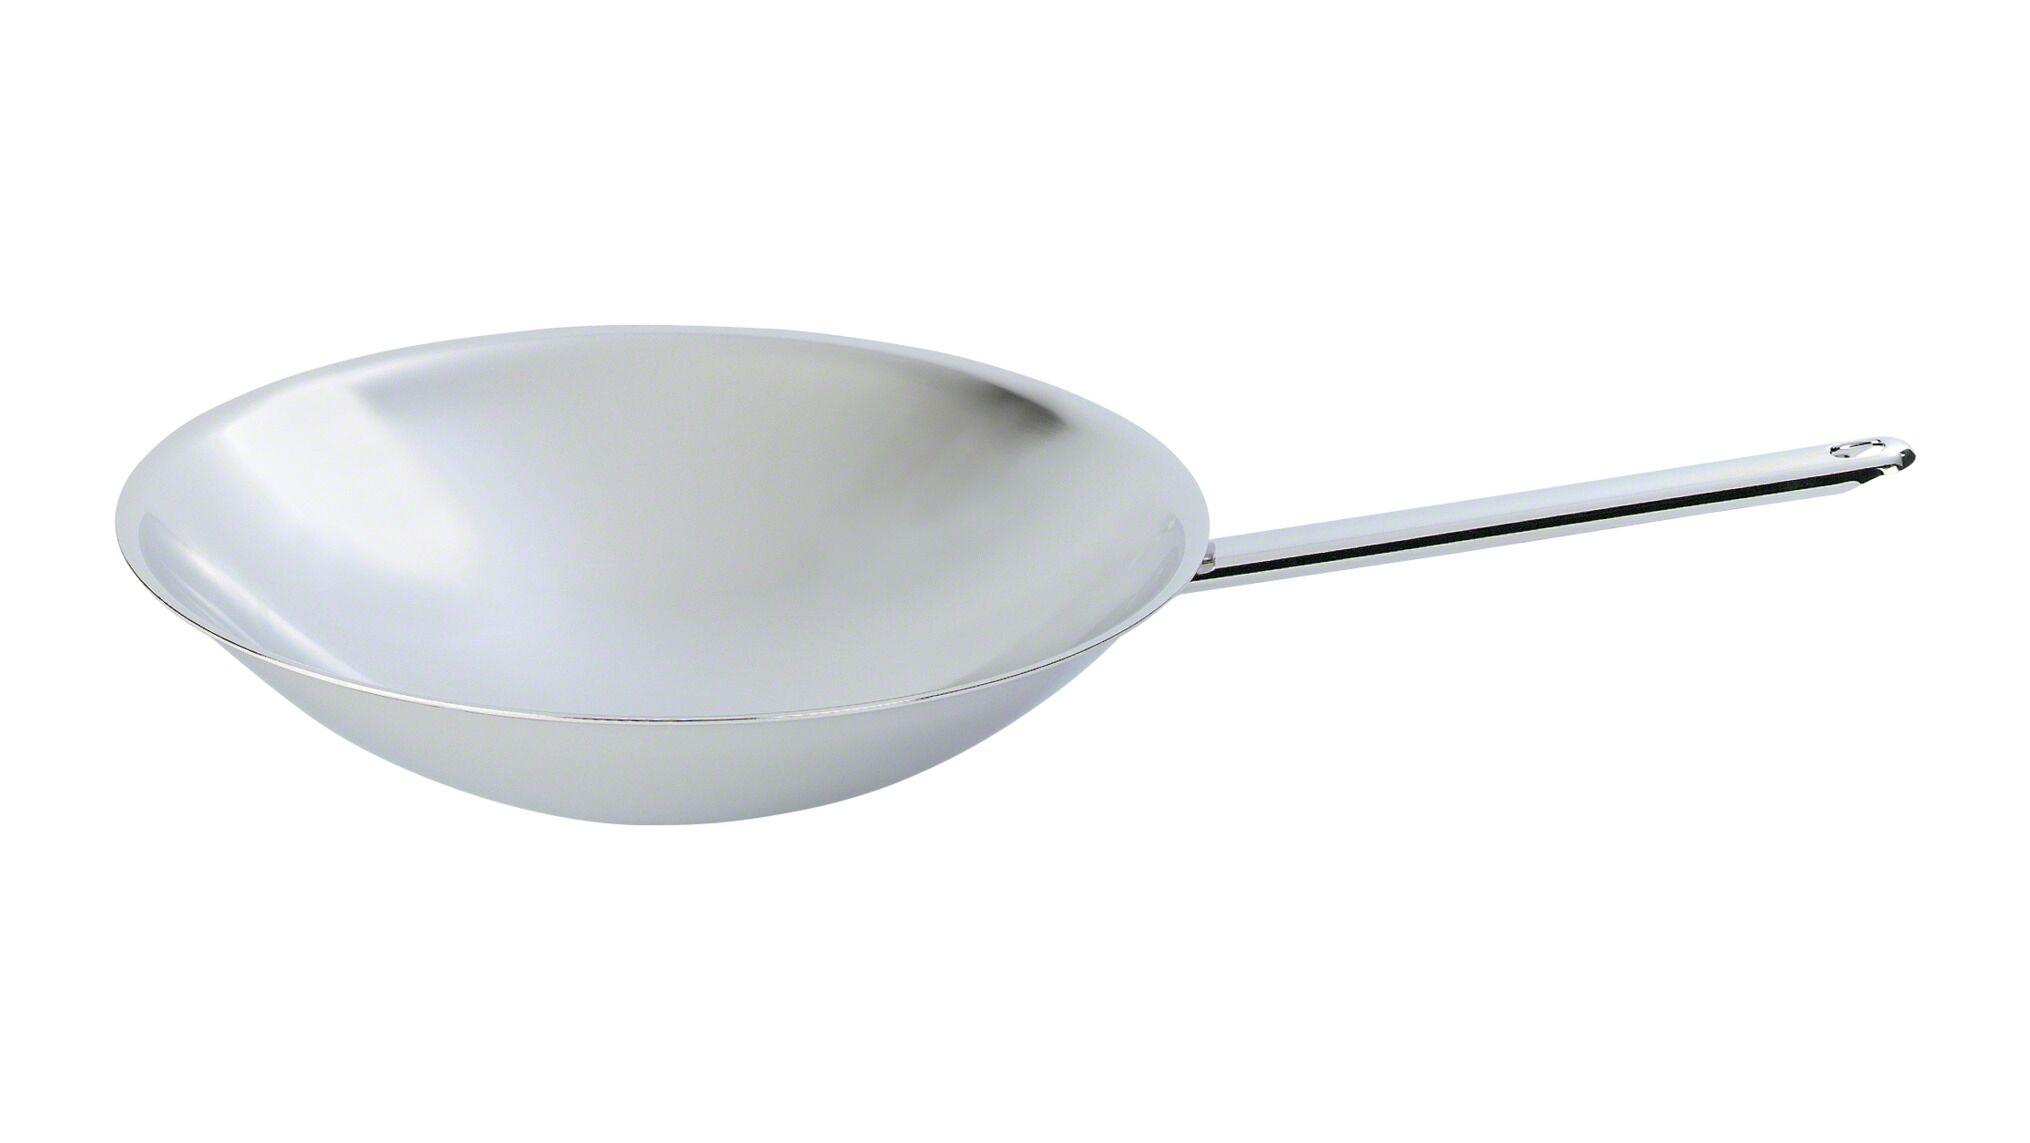 Demeyere Klassisk wok i rustfrit stål, ProControl, Wok, 36 cm